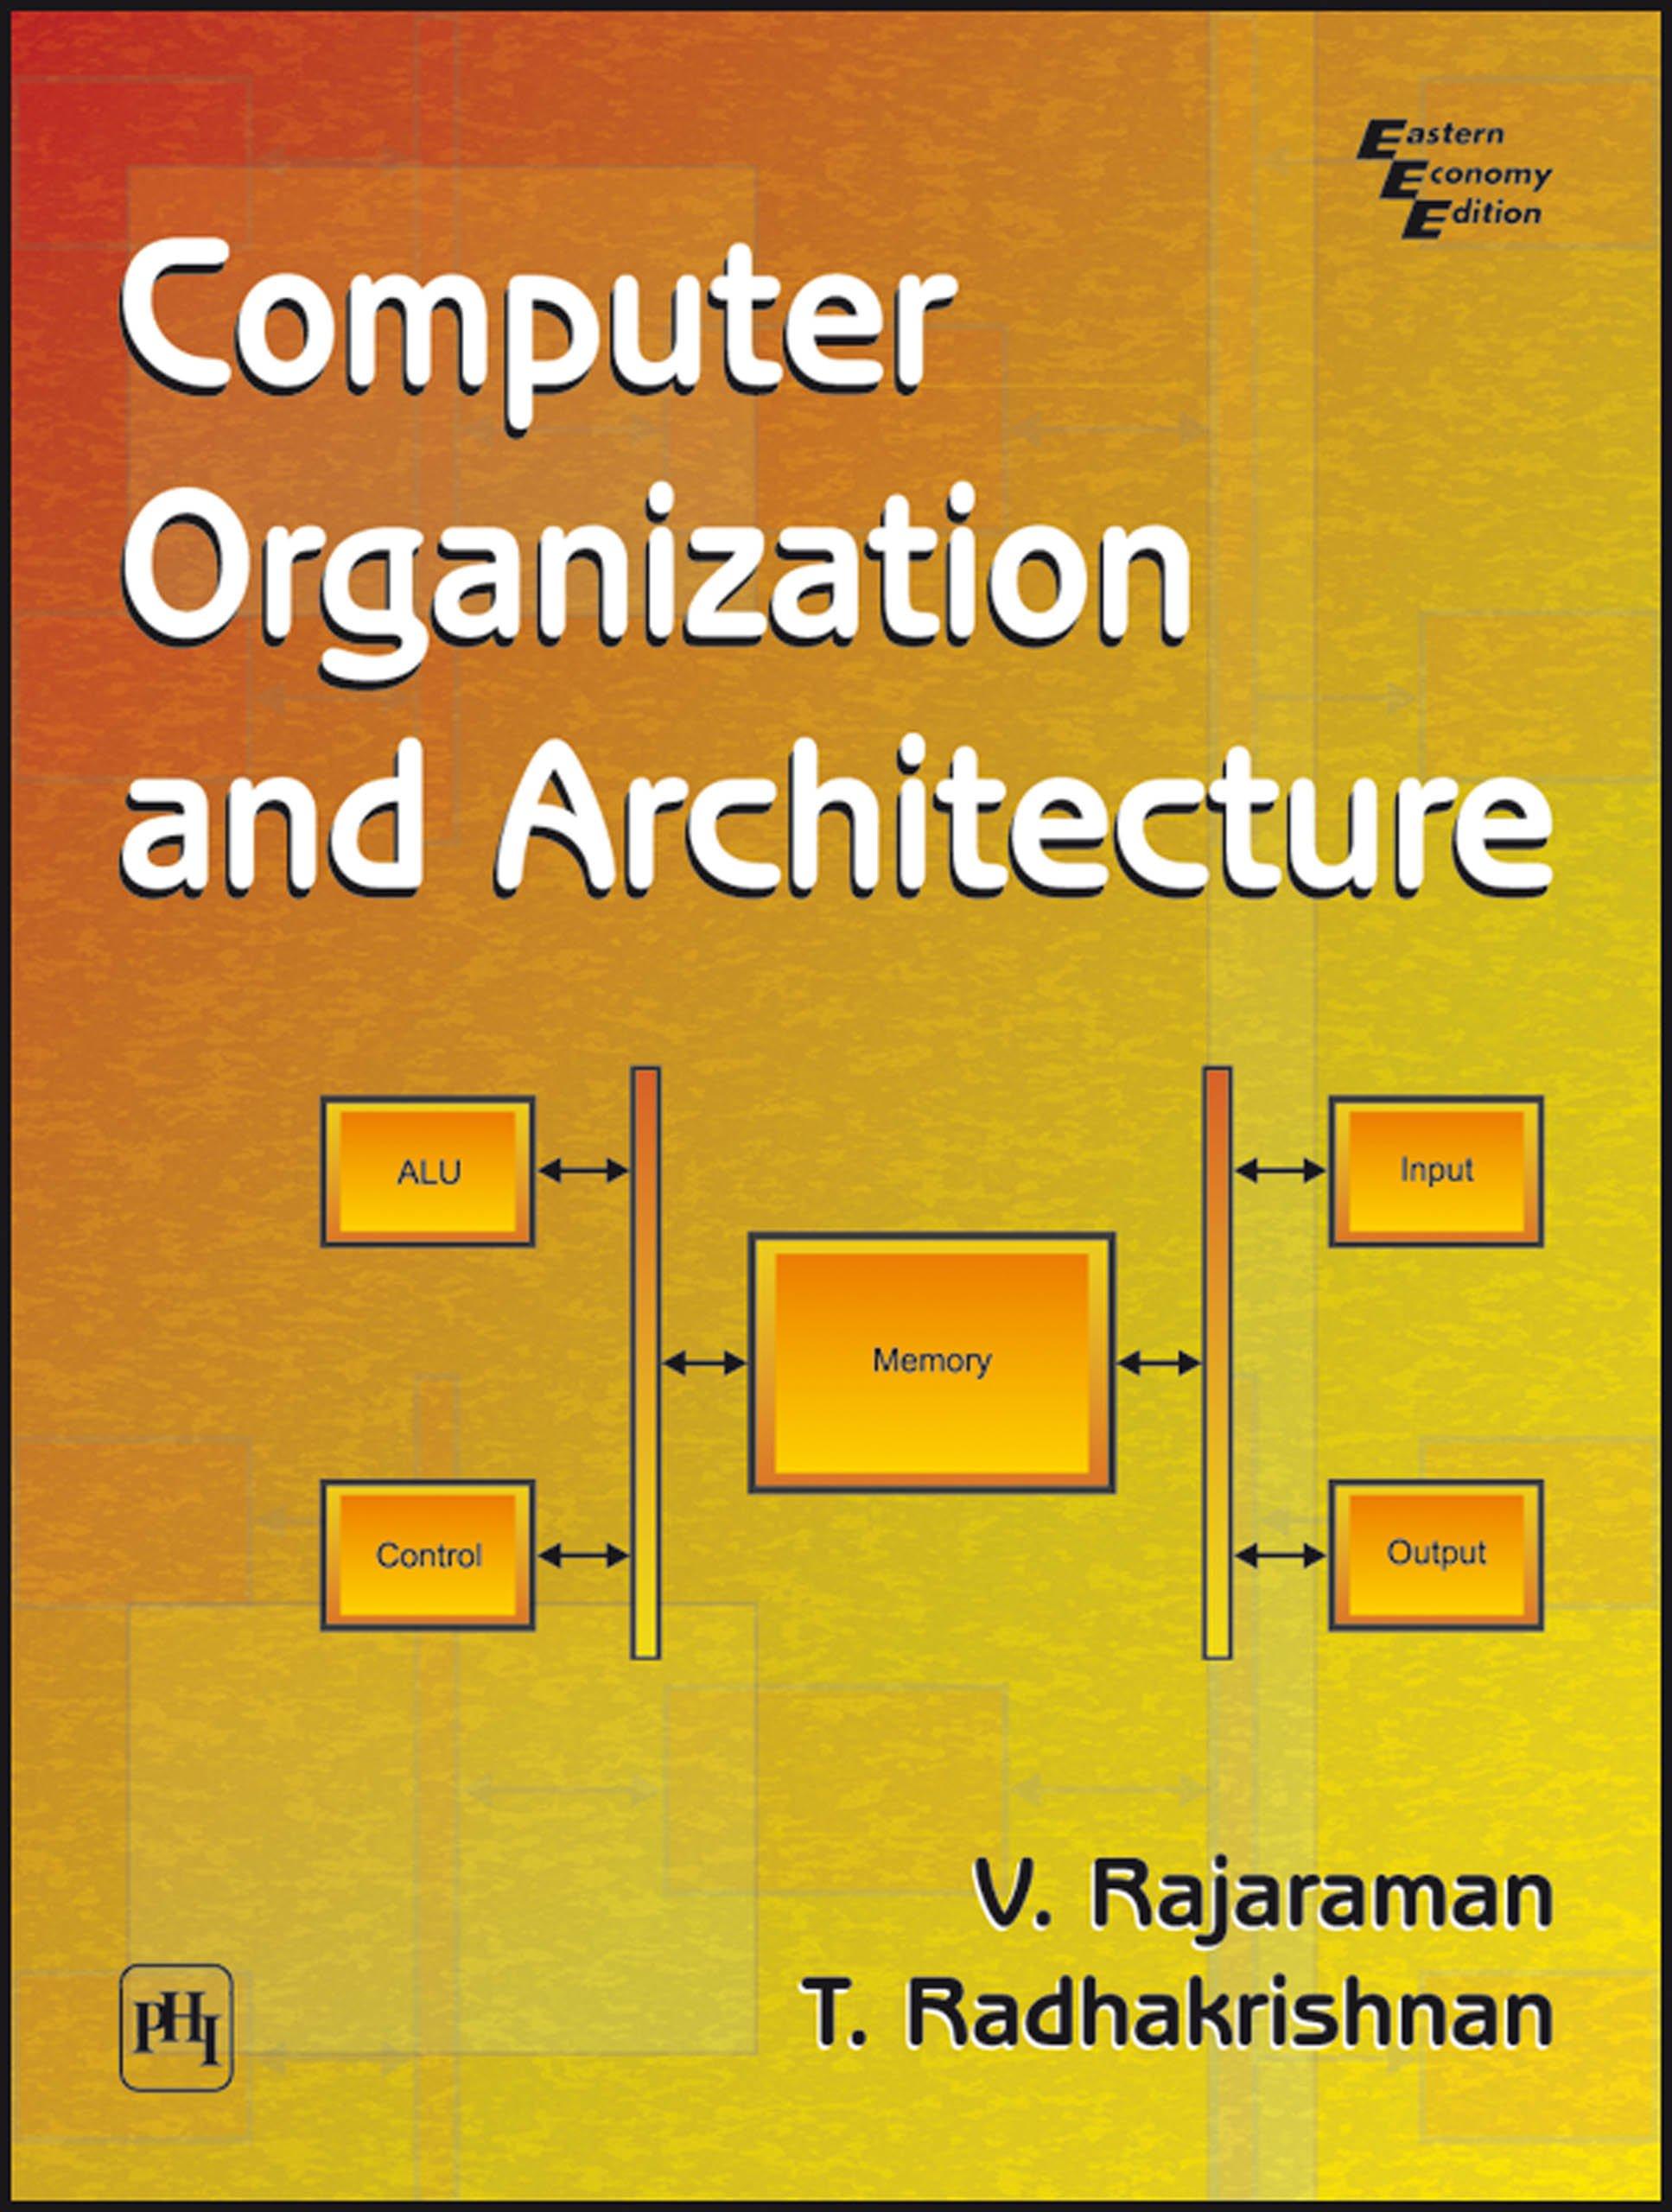 Computer Organization And Architecture Rajaraman V Radhakrishnan T Ebook Amazon Com